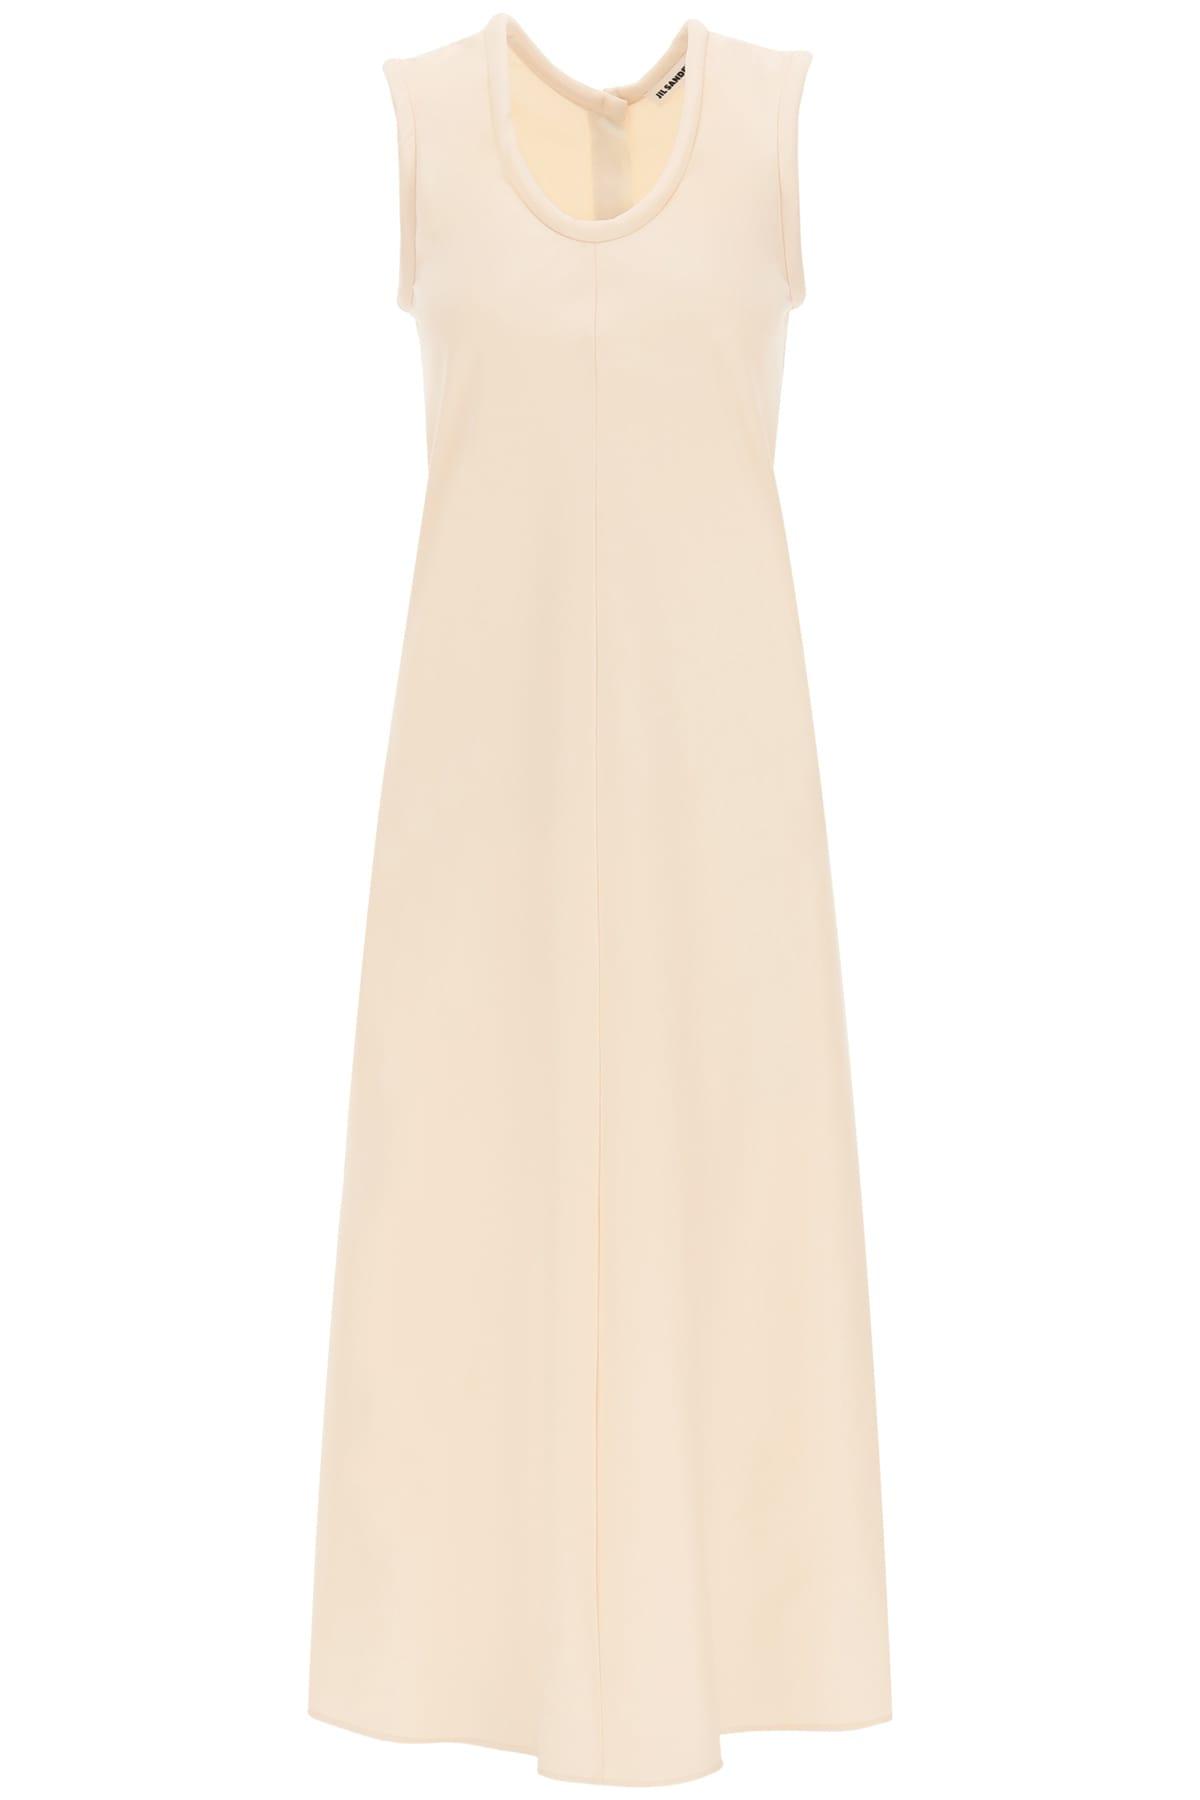 Buy Jil Sander Long Satin Dress online, shop Jil Sander with free shipping